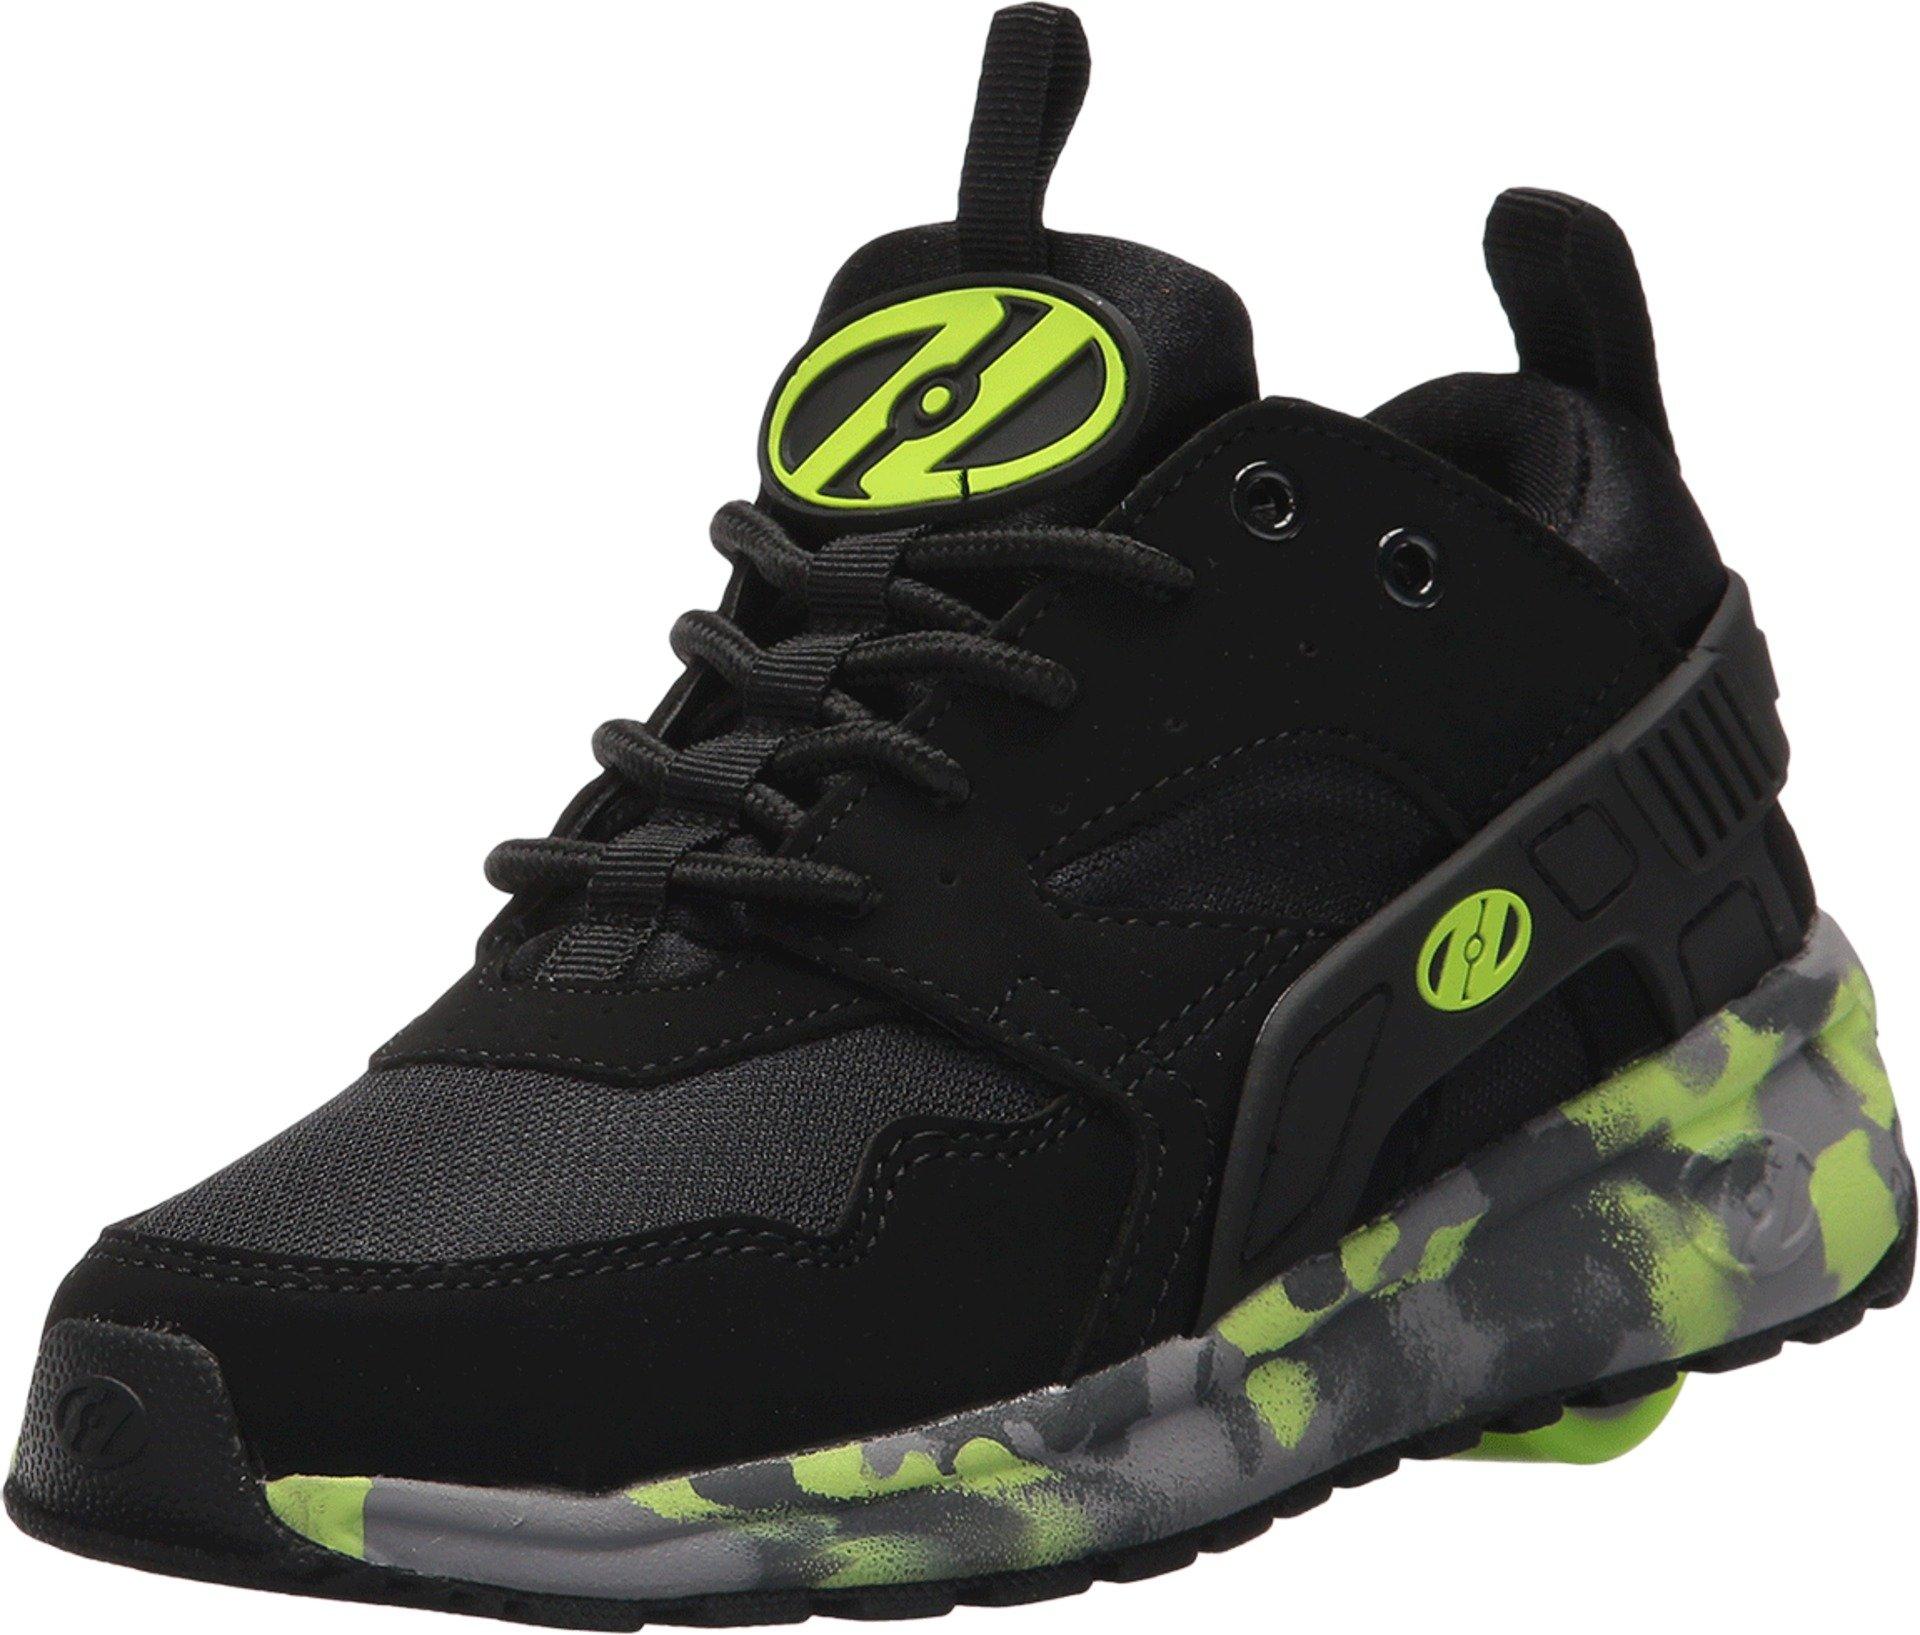 Heelys HE100095H Kid's Force Sneakers, Black/Brightyellow/Confet - 8 by Heelys (Image #1)